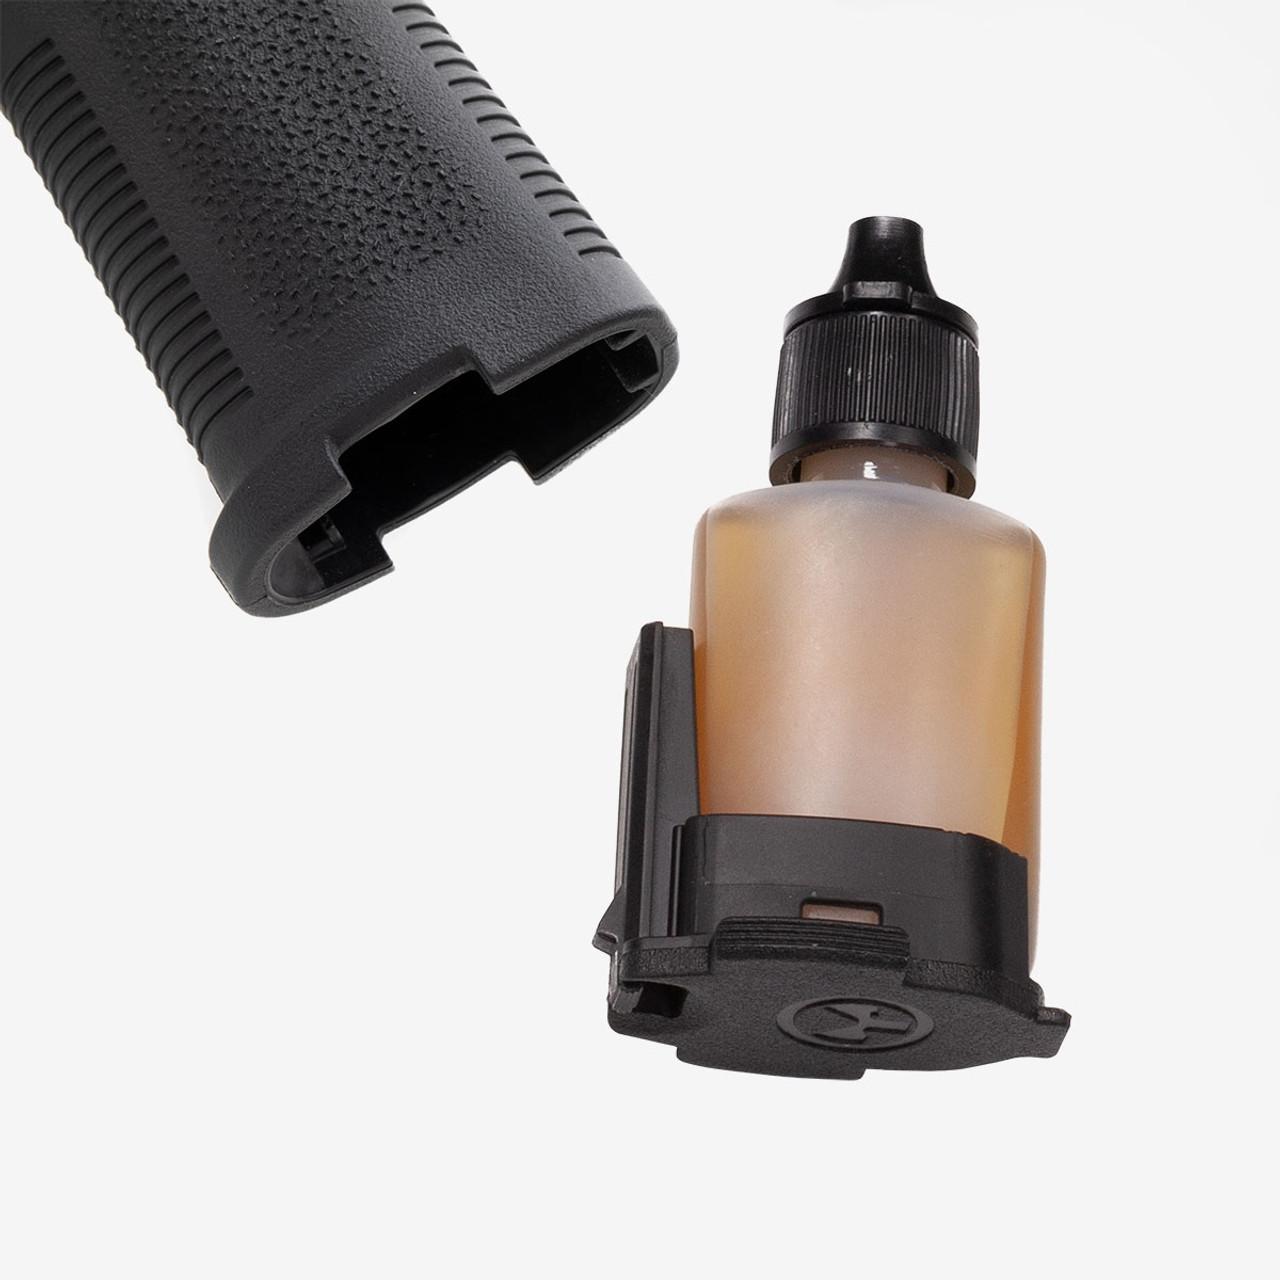 Magpul SL Grip Module - HK94/93/91 & Semi Shelf HK Clones